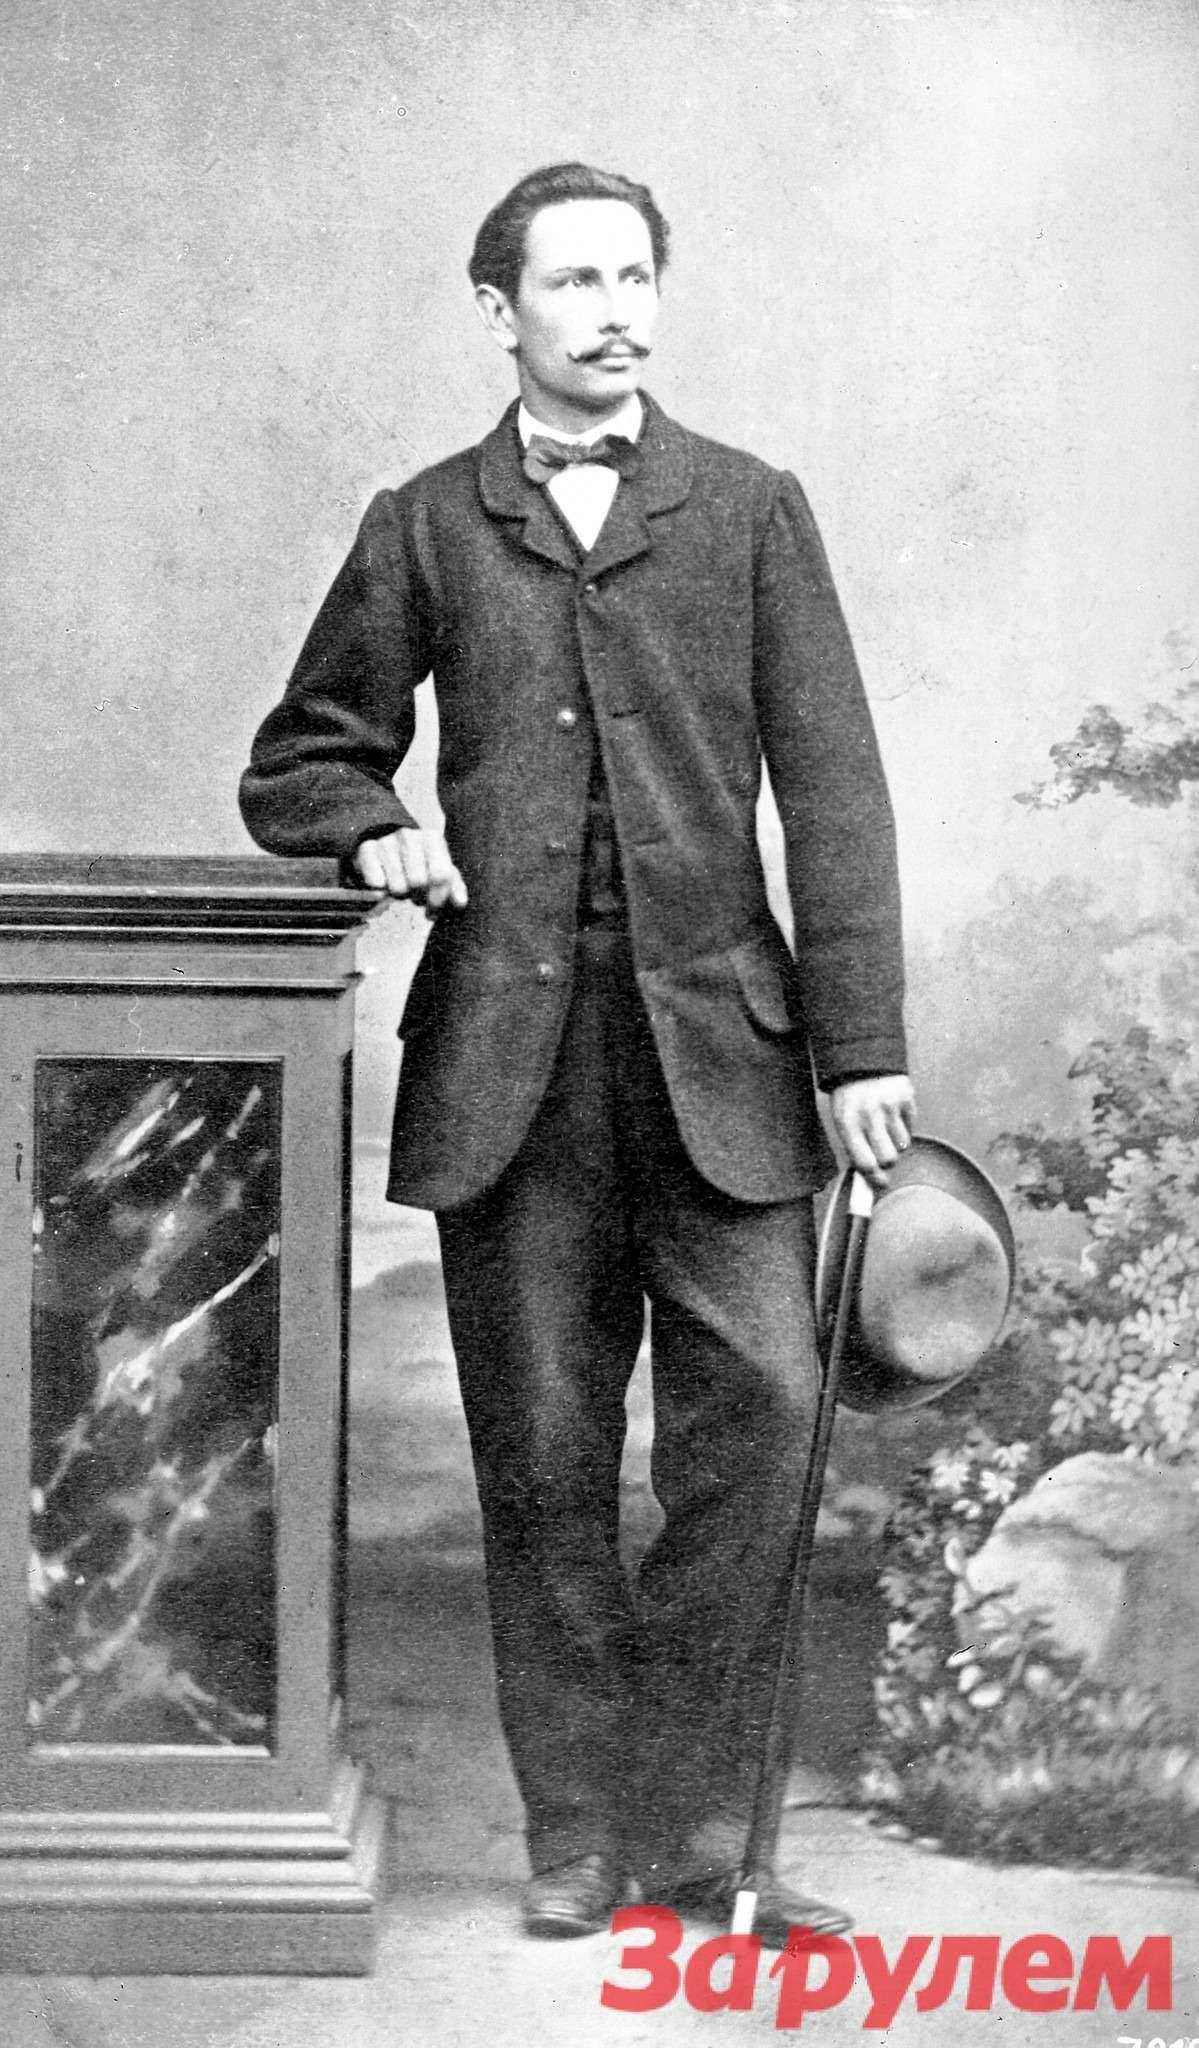 Карл Бенц (26.11.1844— 04.04.1929)— изобретатель автомобиля